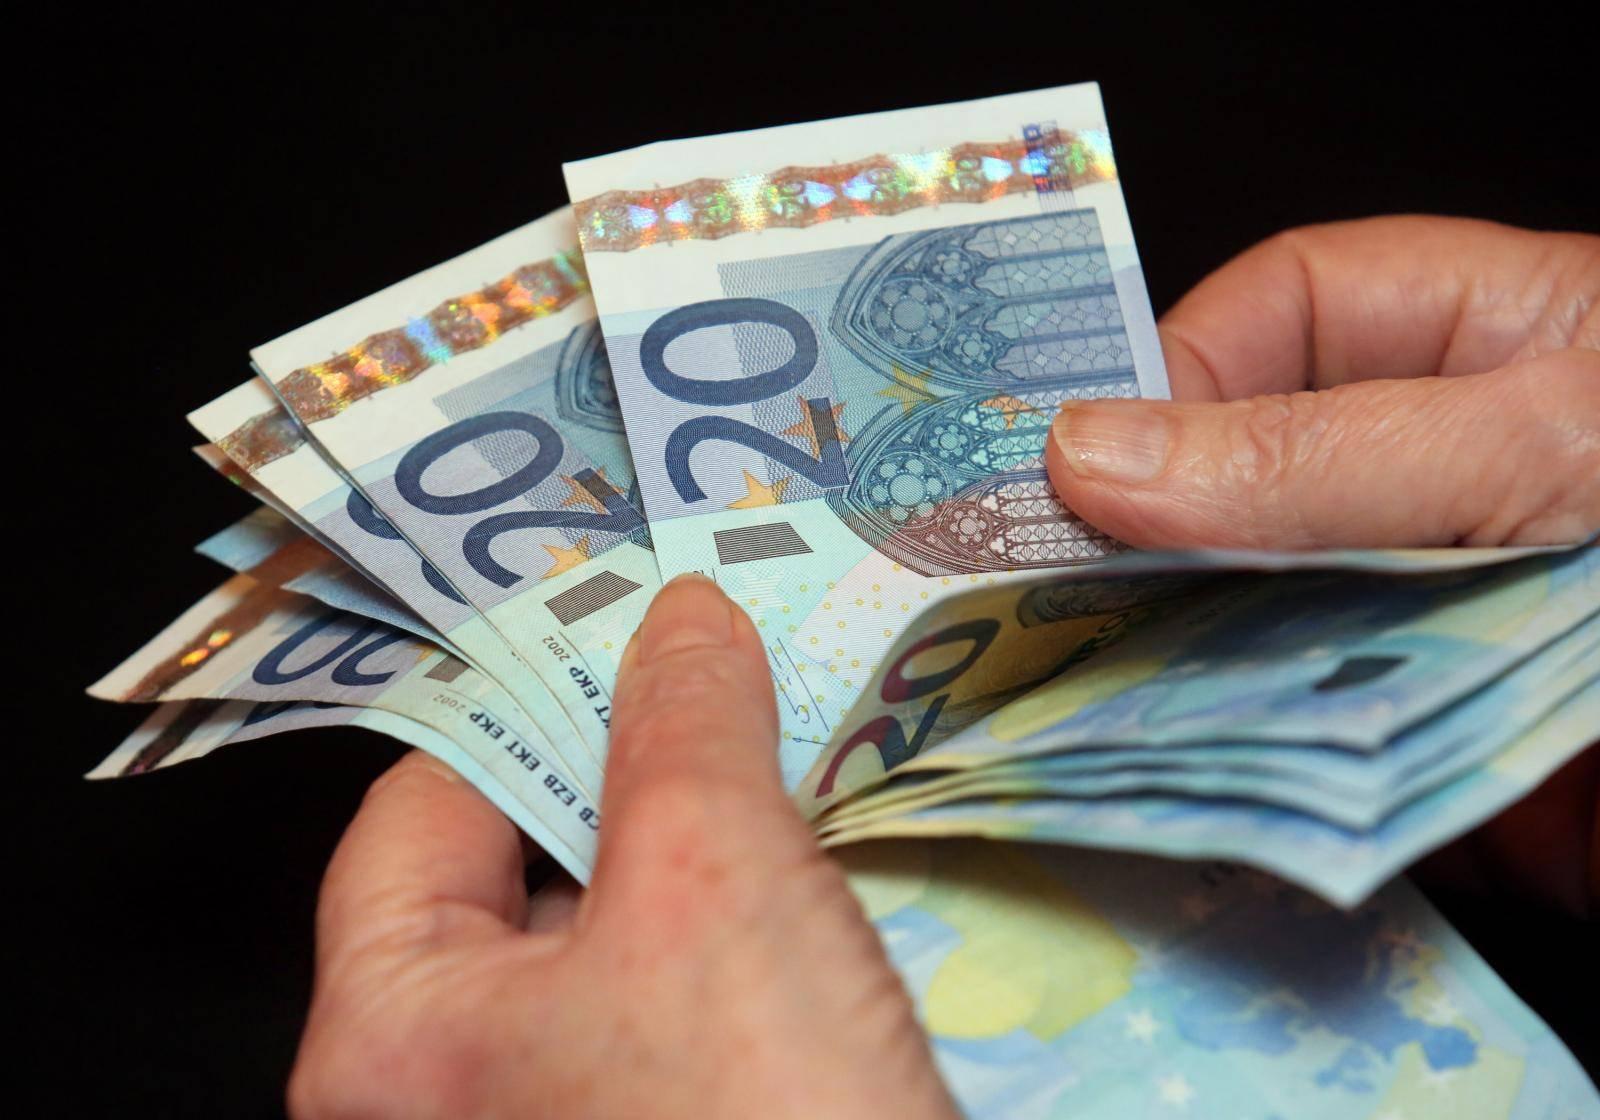 Pošteni prolaznik vratio ruksak sa 16.000 eura: Odbio nagradu!